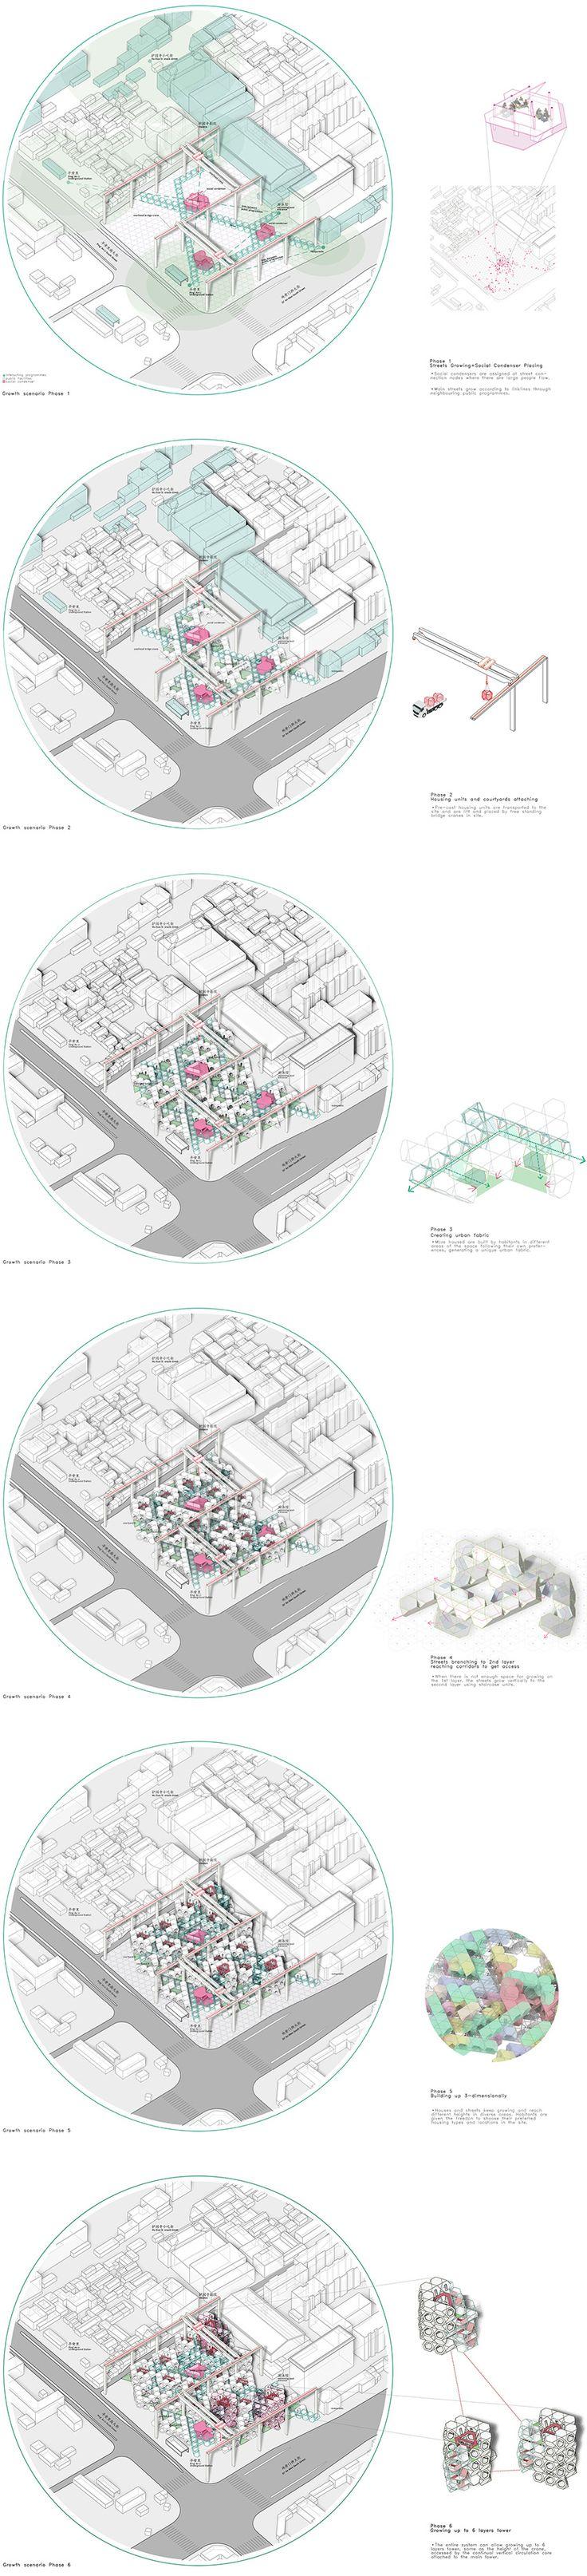 AA School of Architecture 2013 - Intermediate 6 - Ke Wang